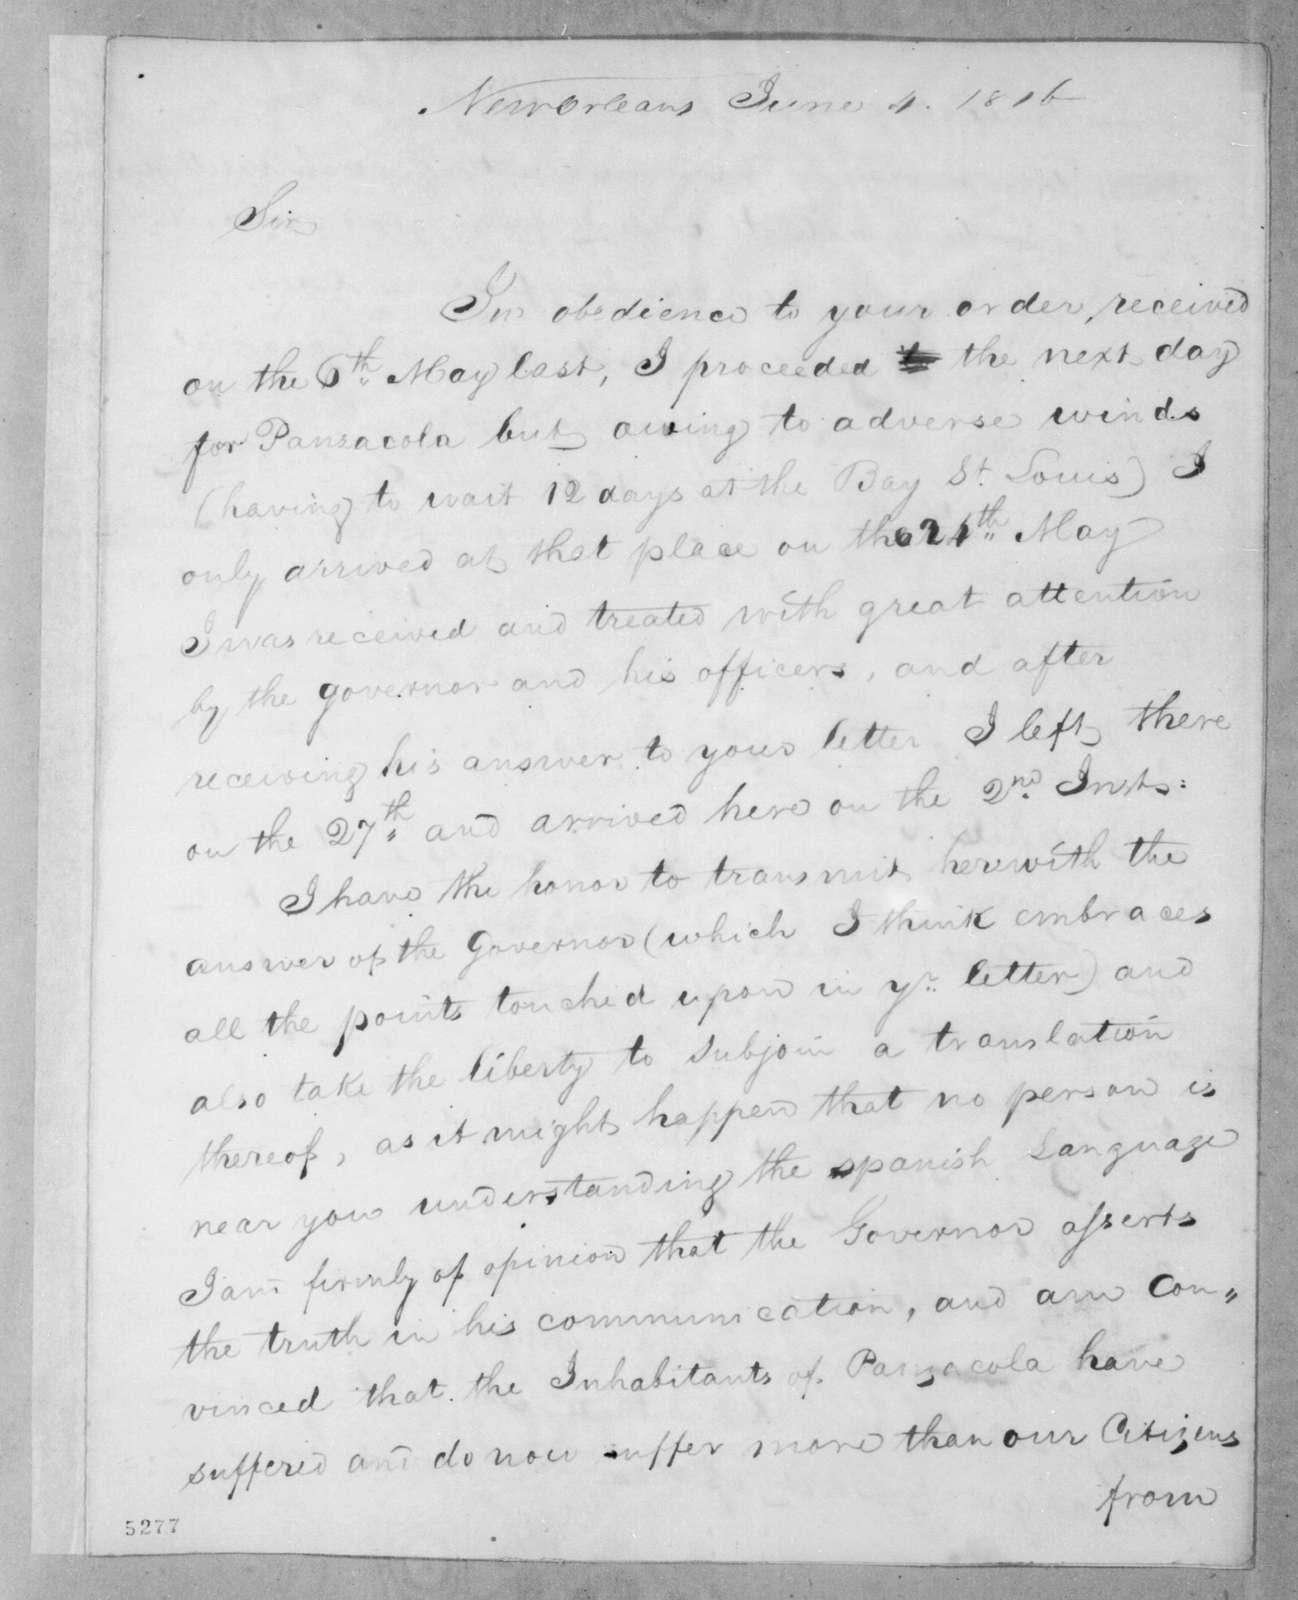 Ferdinand Louis Amelung to Andrew Jackson, June 4, 1816